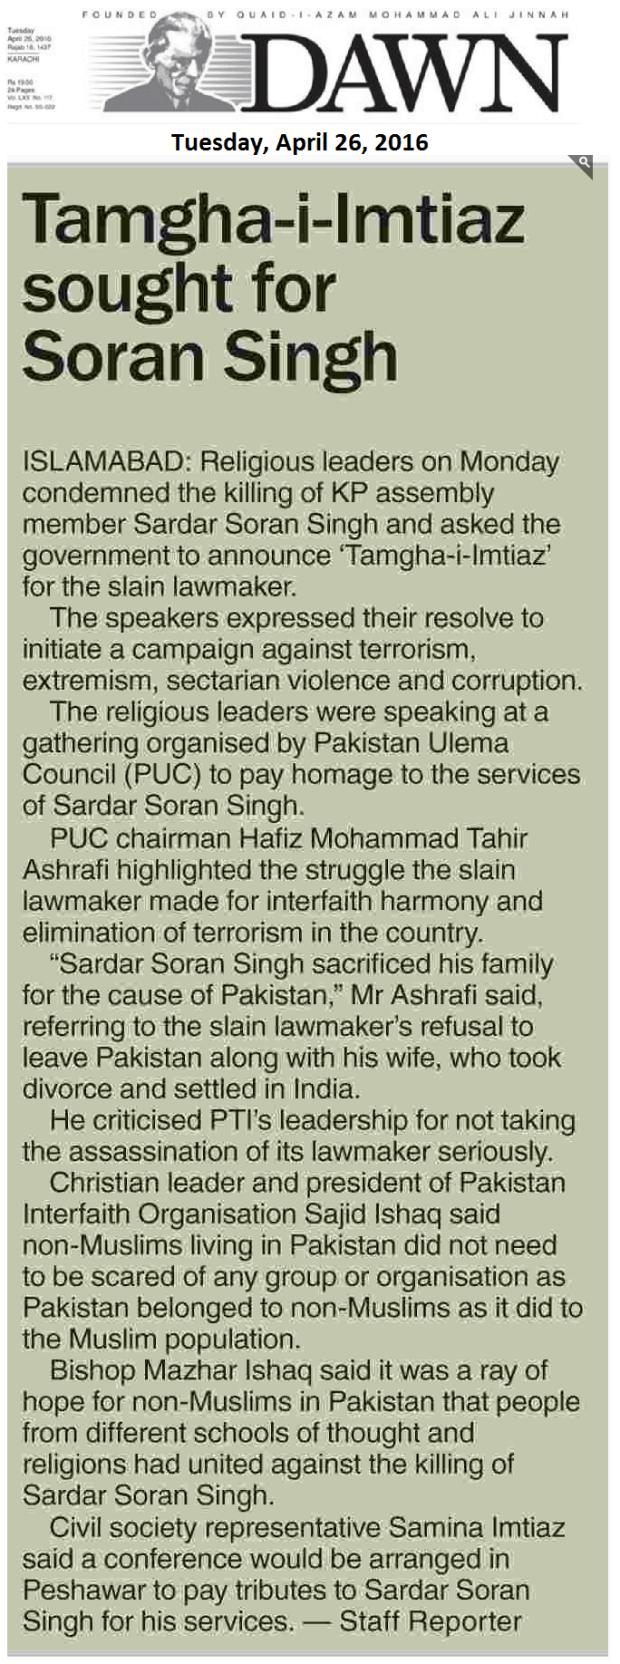 Religious Leader Laud Soran Singh's Services to Pakistan 26 April 2016